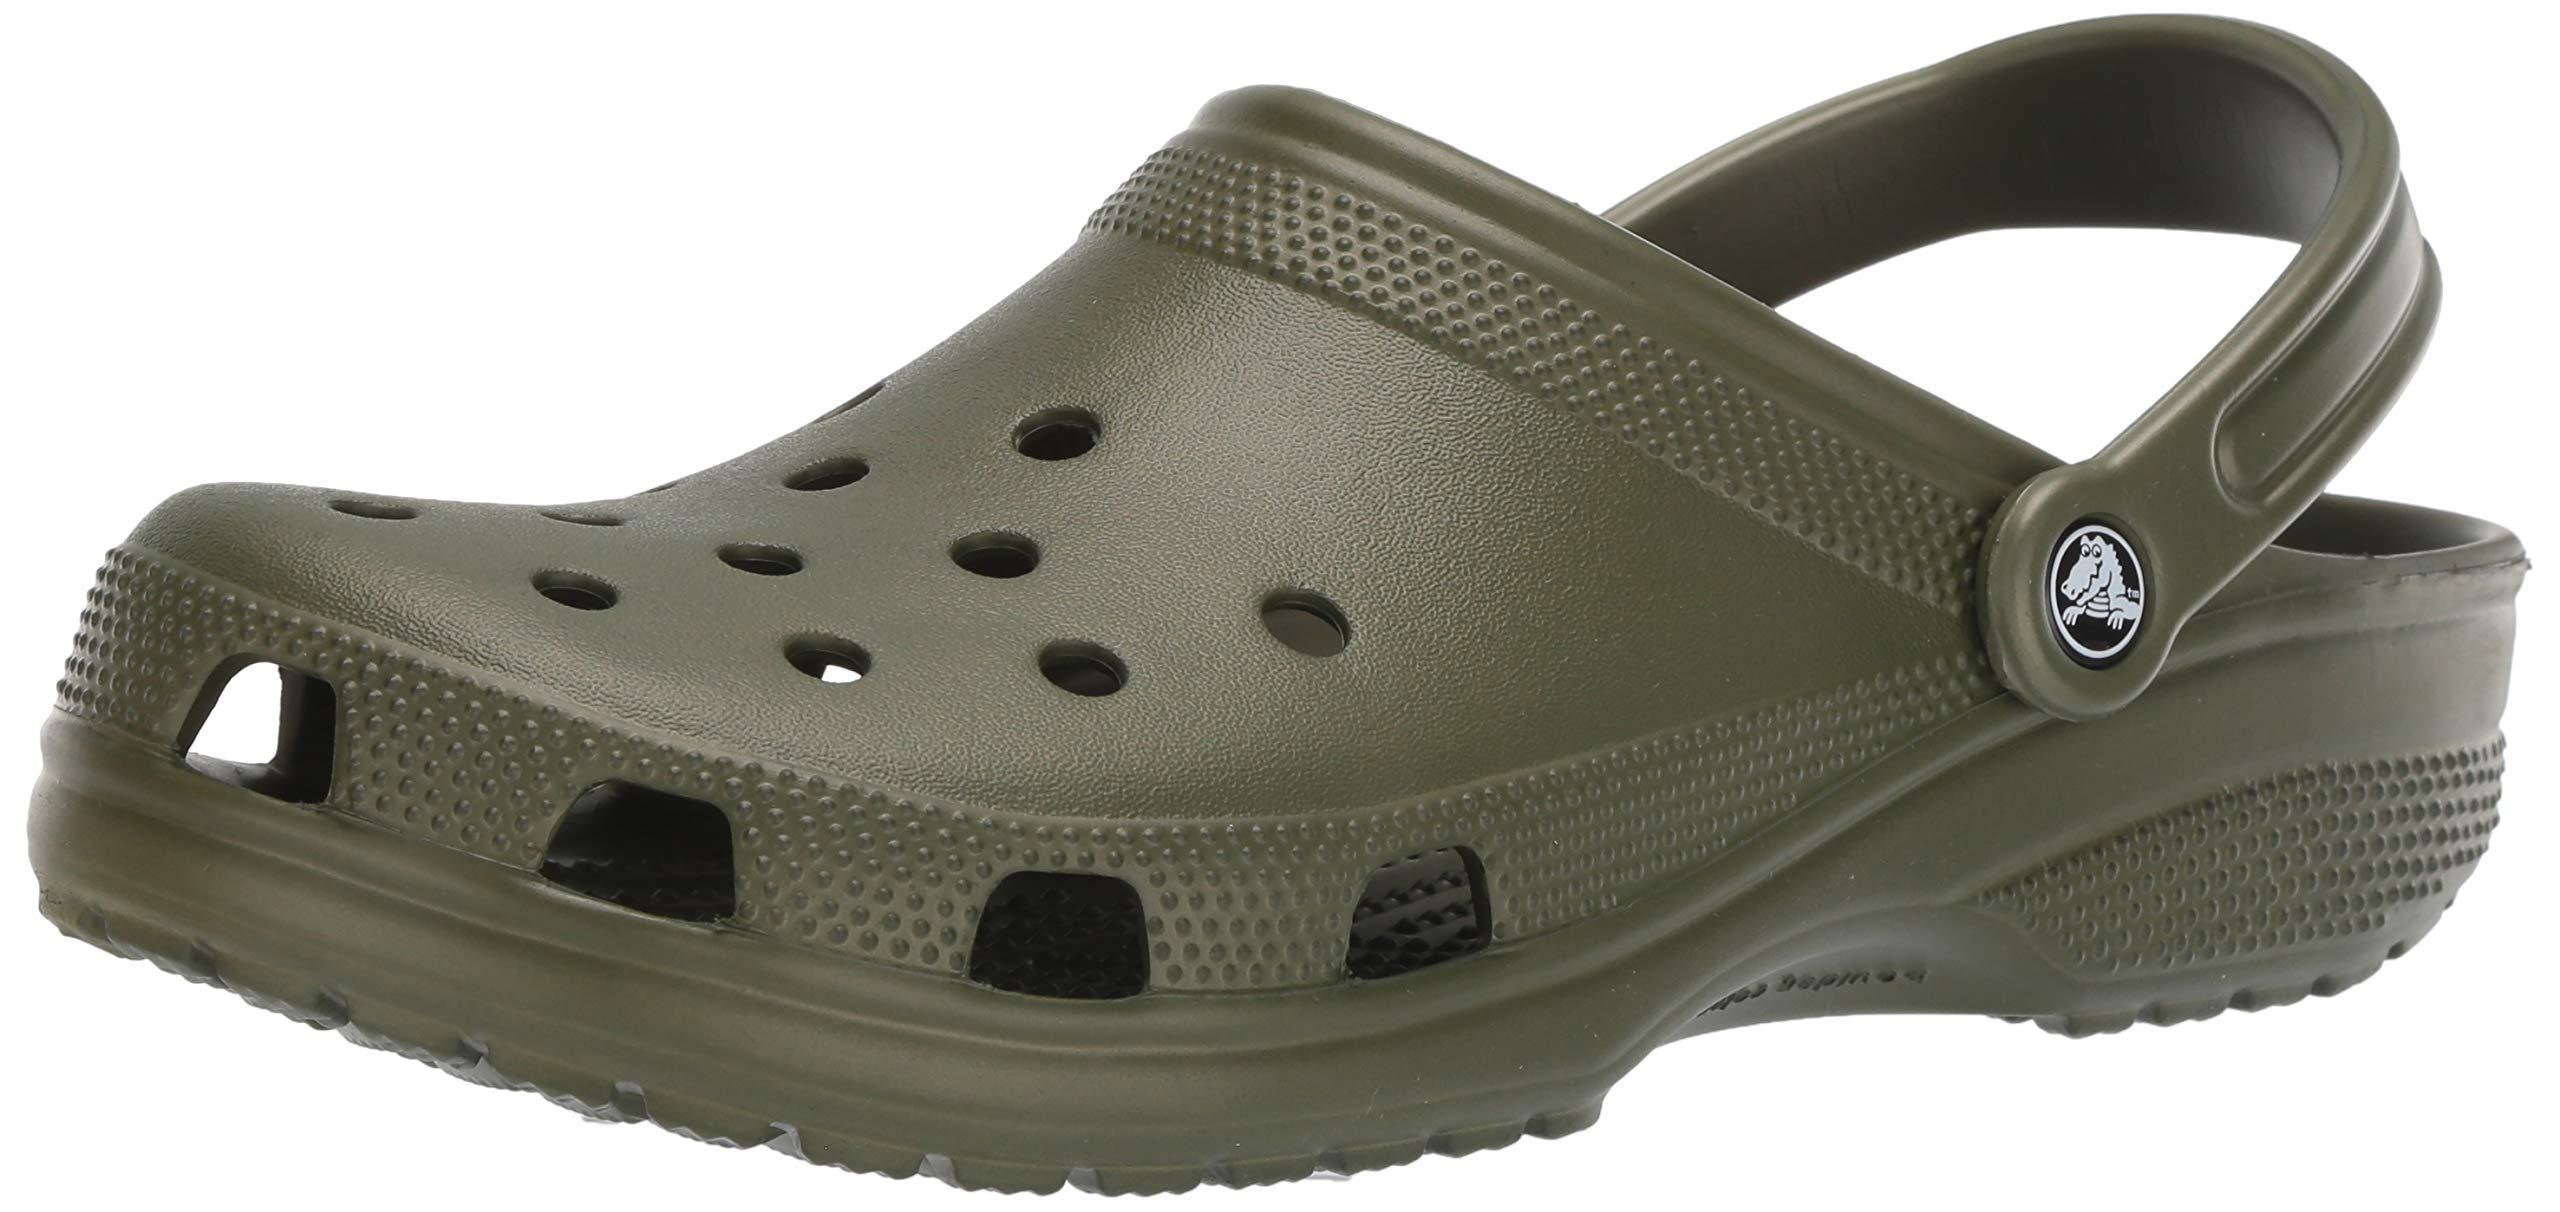 Crocs Men's and Women's Classic Clog, Comfort Slip On Casual Water Shoe, Lightweight, Army Green, 14 US Women / 12 US Men